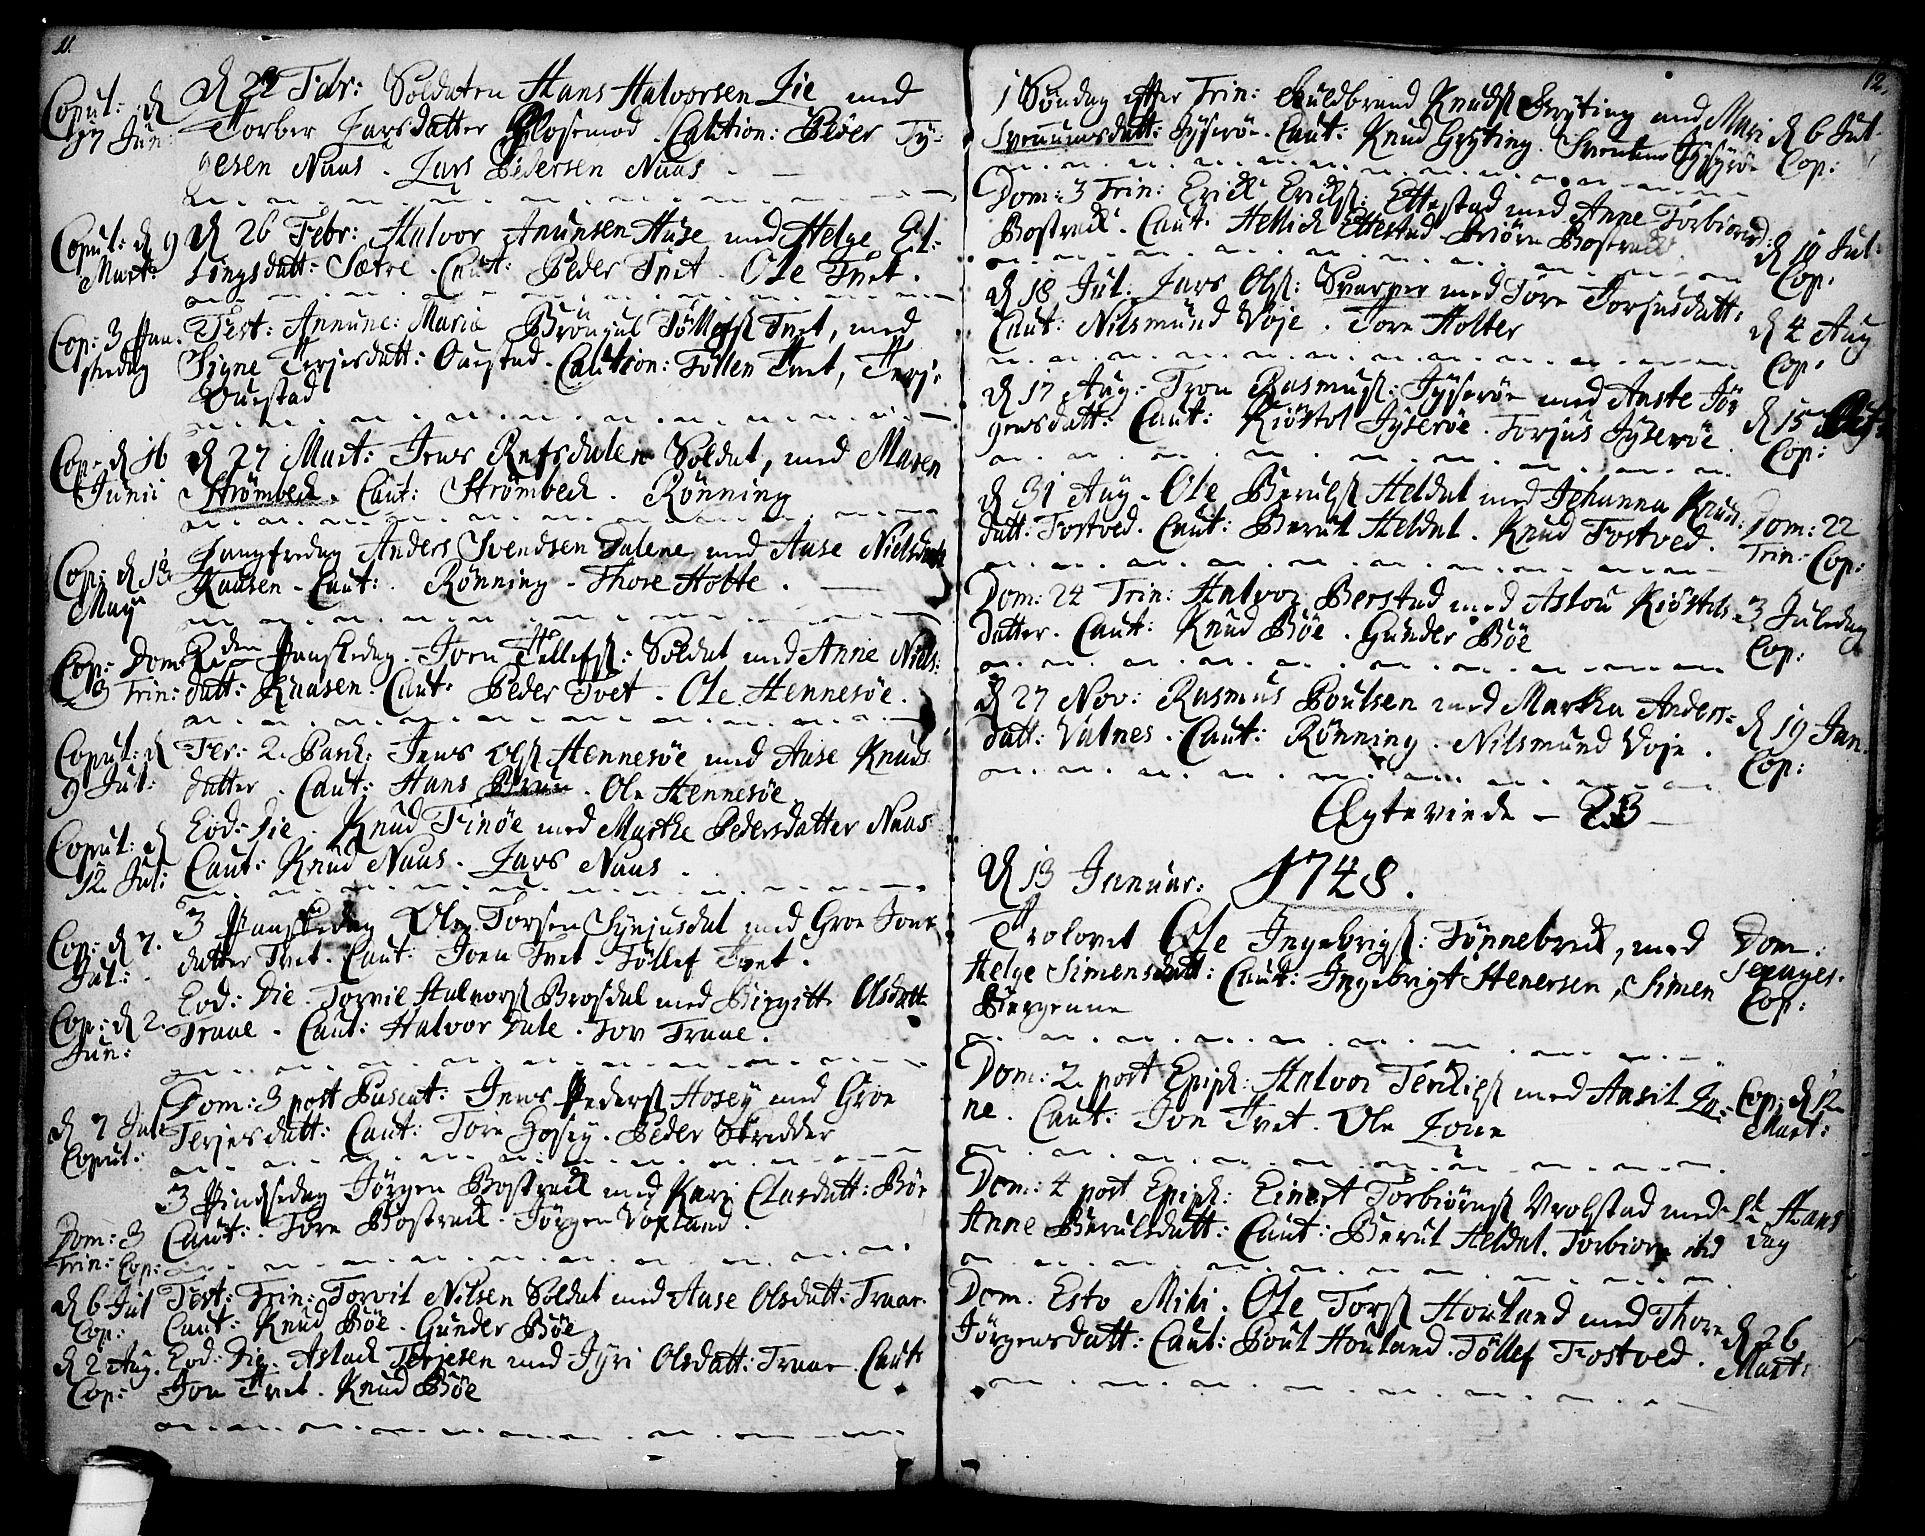 SAKO, Drangedal kirkebøker, F/Fa/L0001: Ministerialbok nr. 1, 1697-1767, s. 11-12